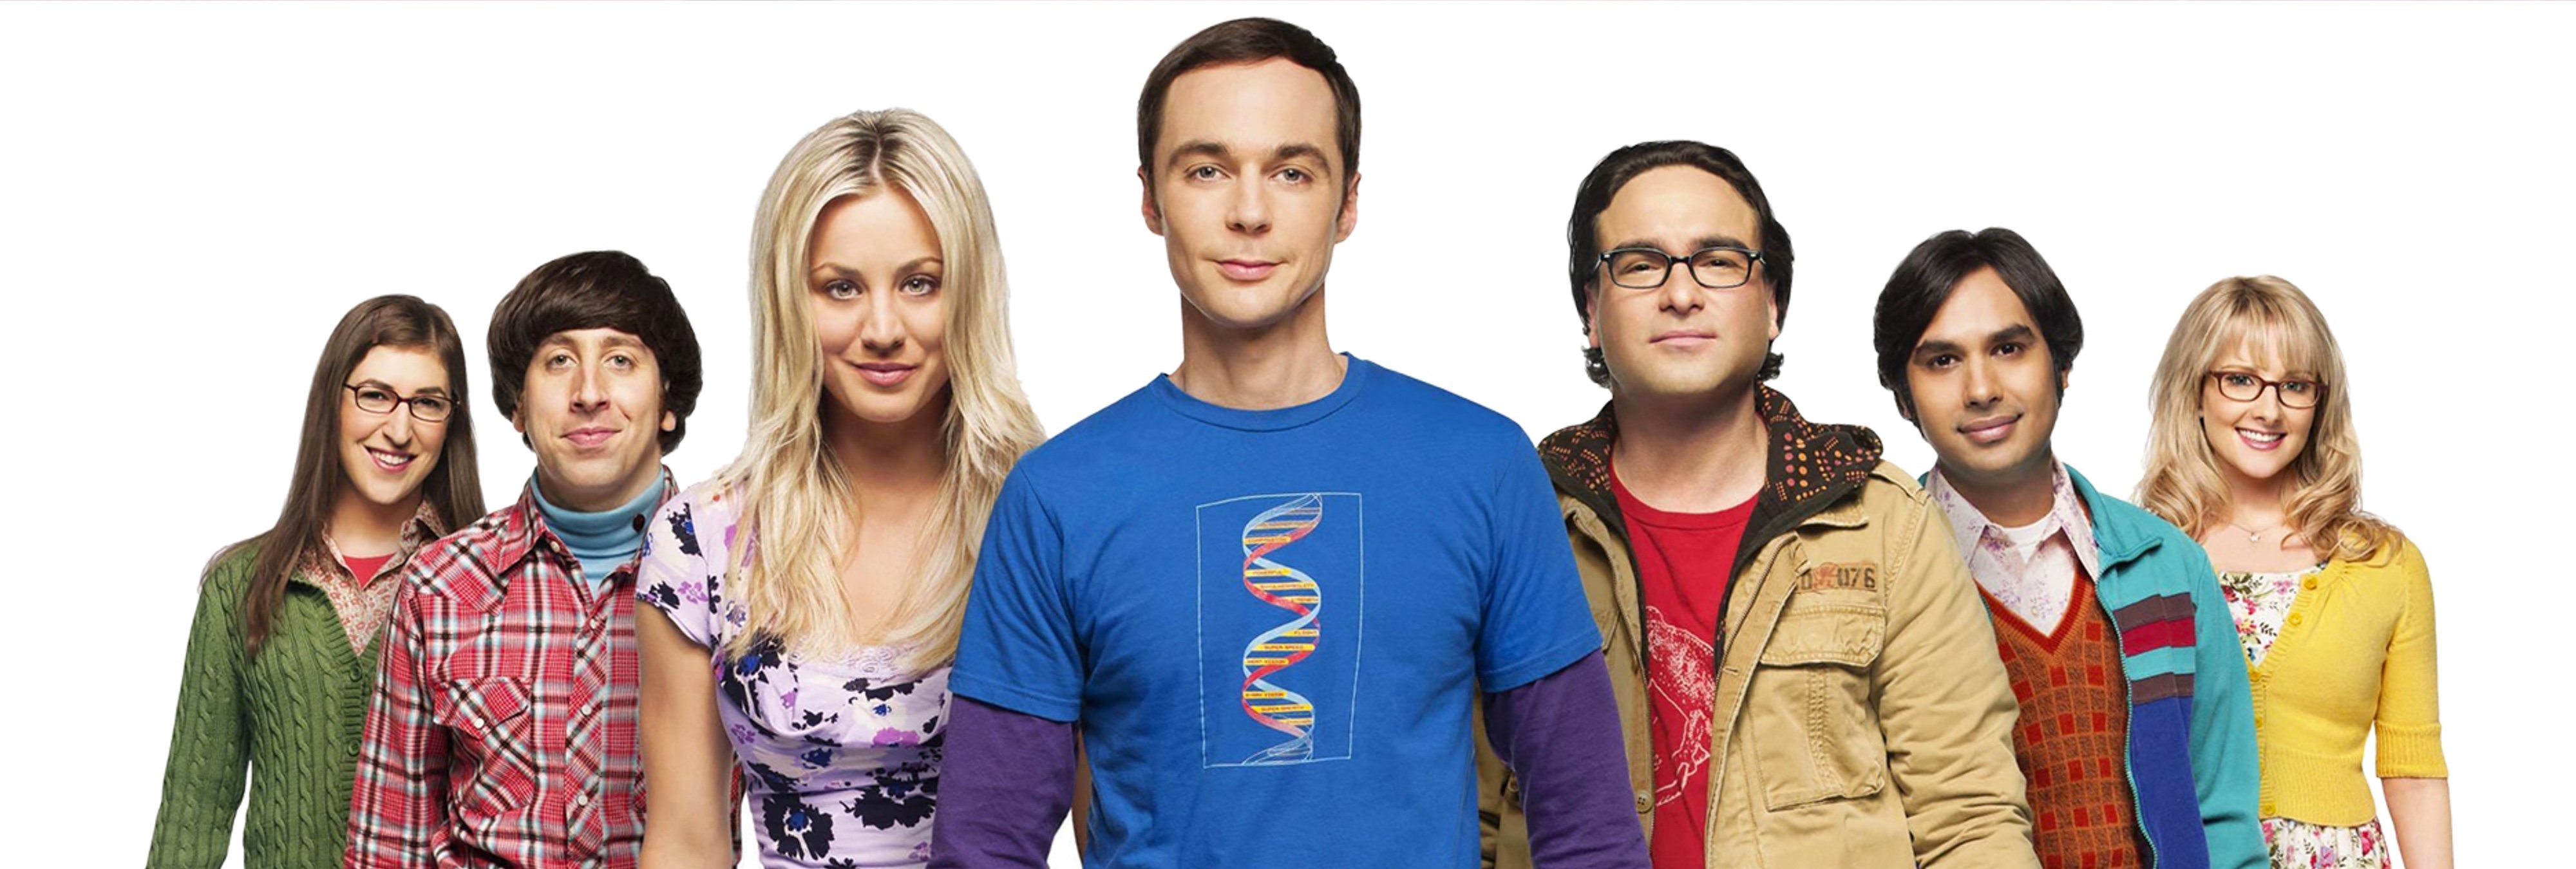 Macaulay Culkin rechazó ser protagonista de 'The Big Bang Theory'